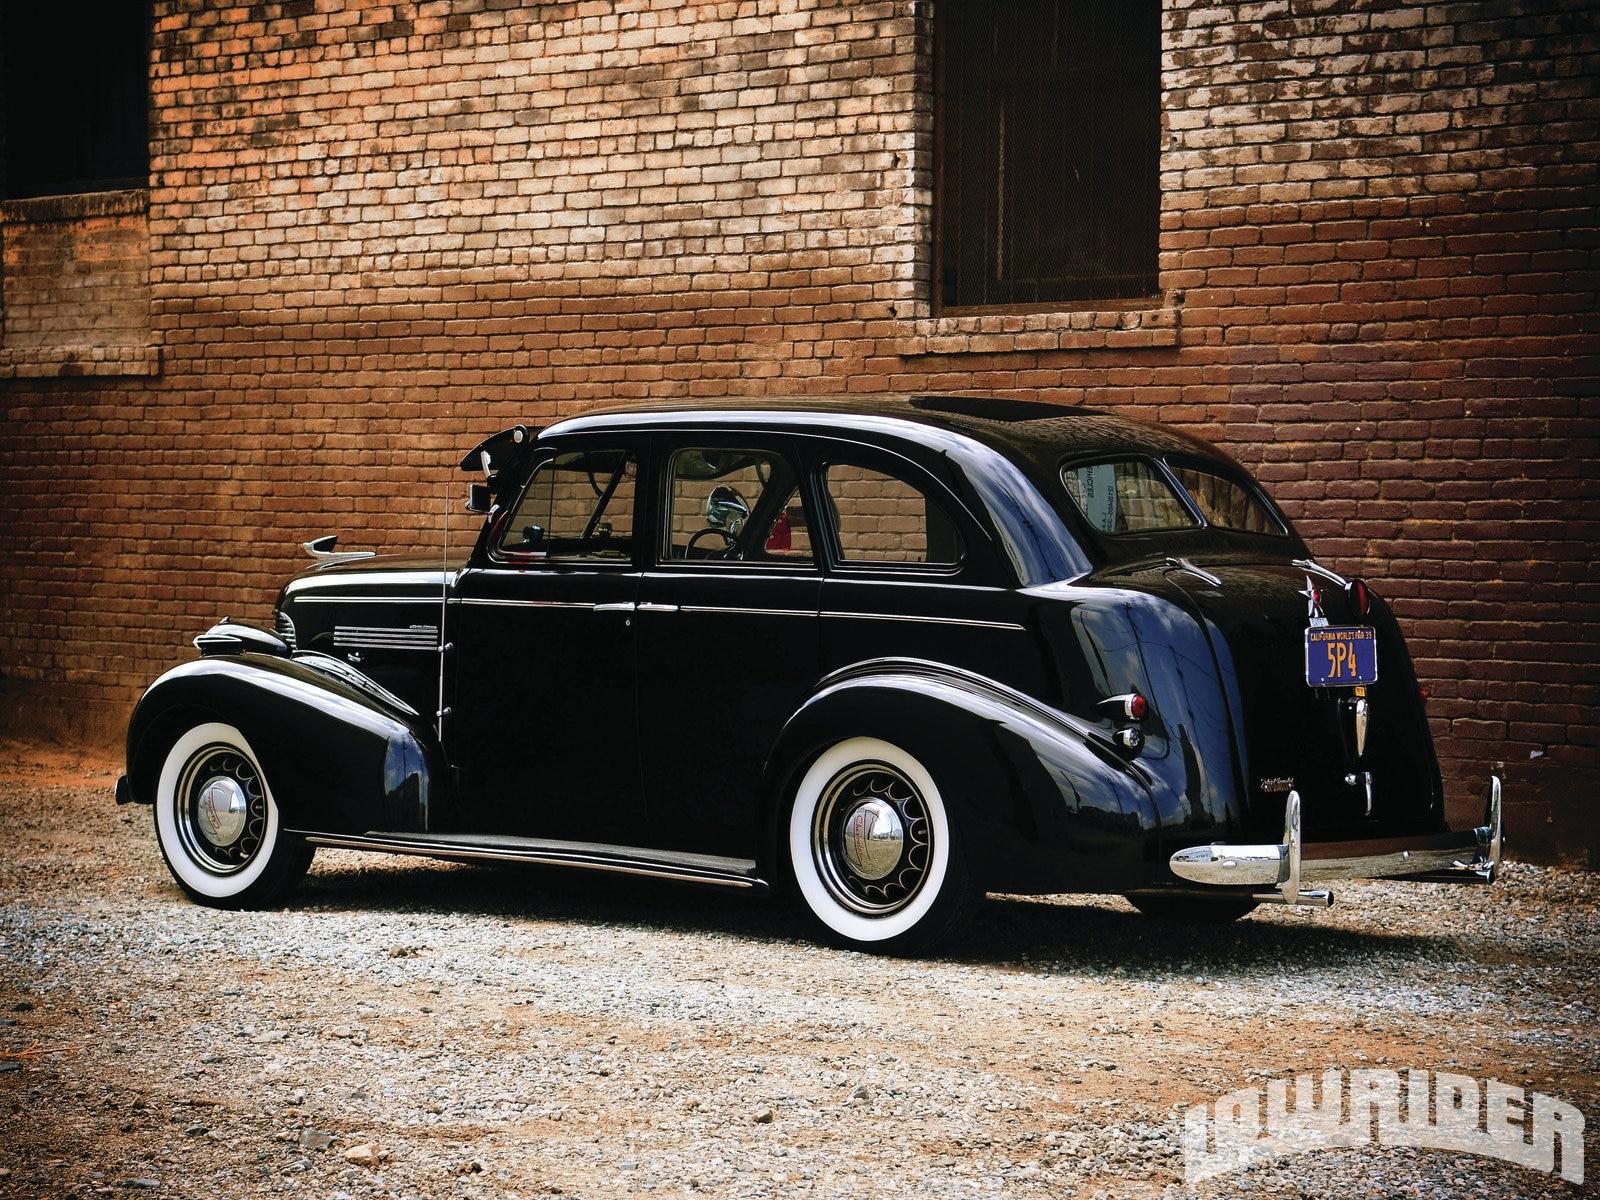 Car Fire Extinguisher >> 1939 Right-Hand Drive Chevrolet Sedan - Lowrider Magazine